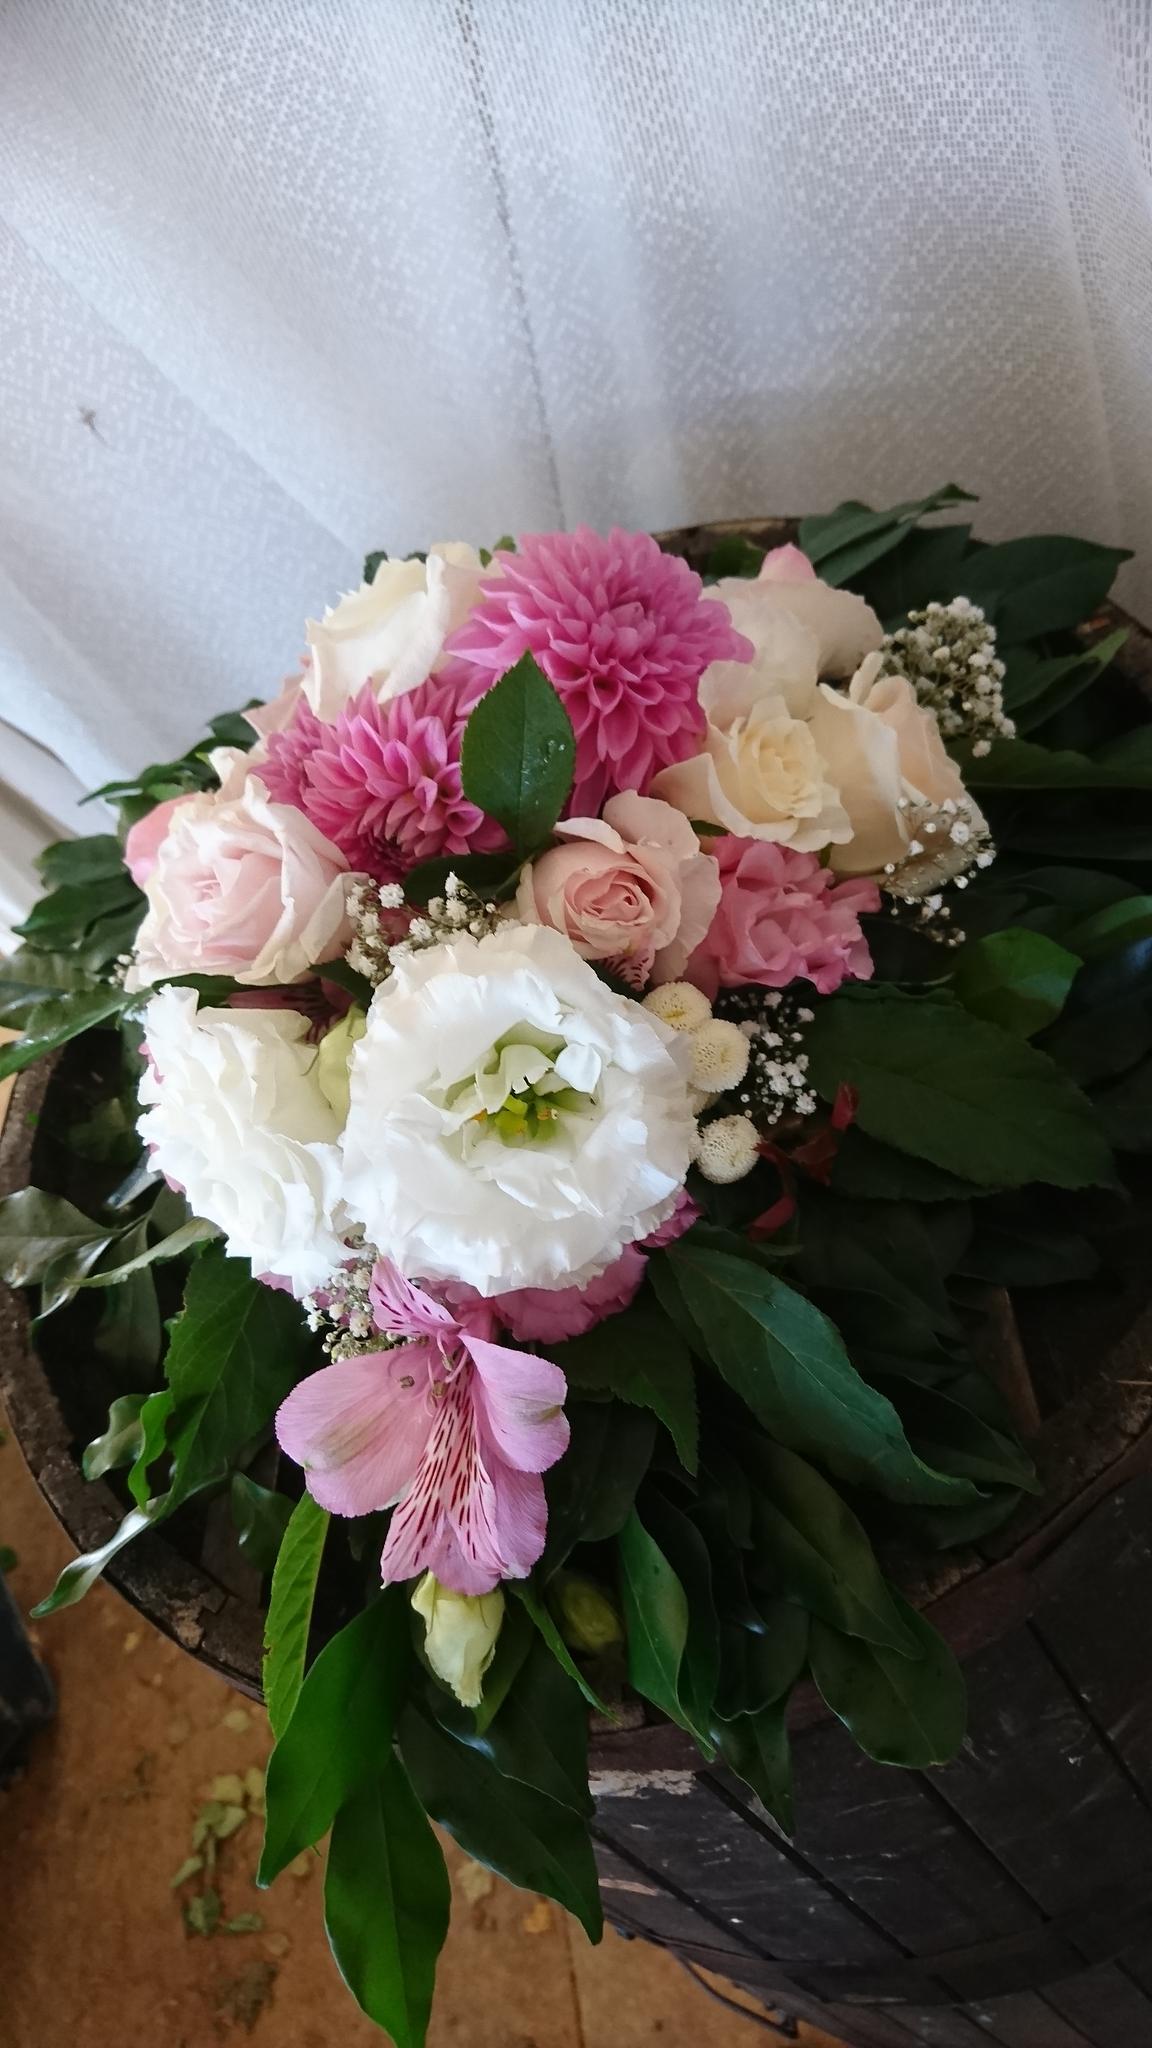 31 Dark Desire Eumundi Roses Dance Ballroom Latin Swing